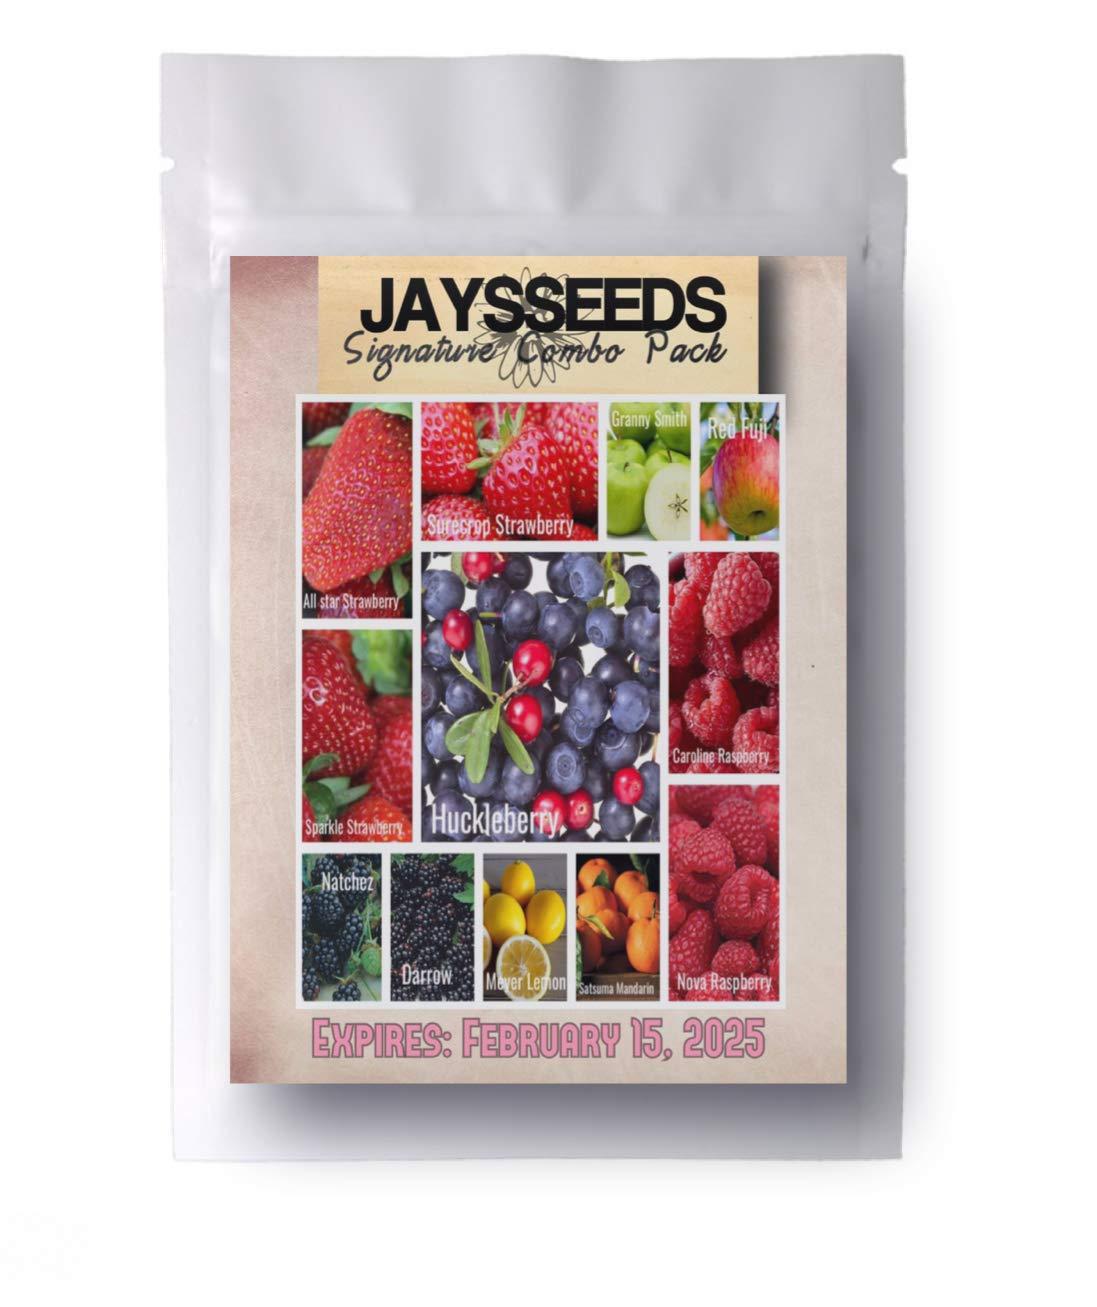 Orchard Bestsellers - Combo Pack Raspberry, BlackBerry, Blueberry, Strawberry, Apple 1,030 Seeds - Lemon, Huckleberry - 12 Varieties - 5 Plant Markers